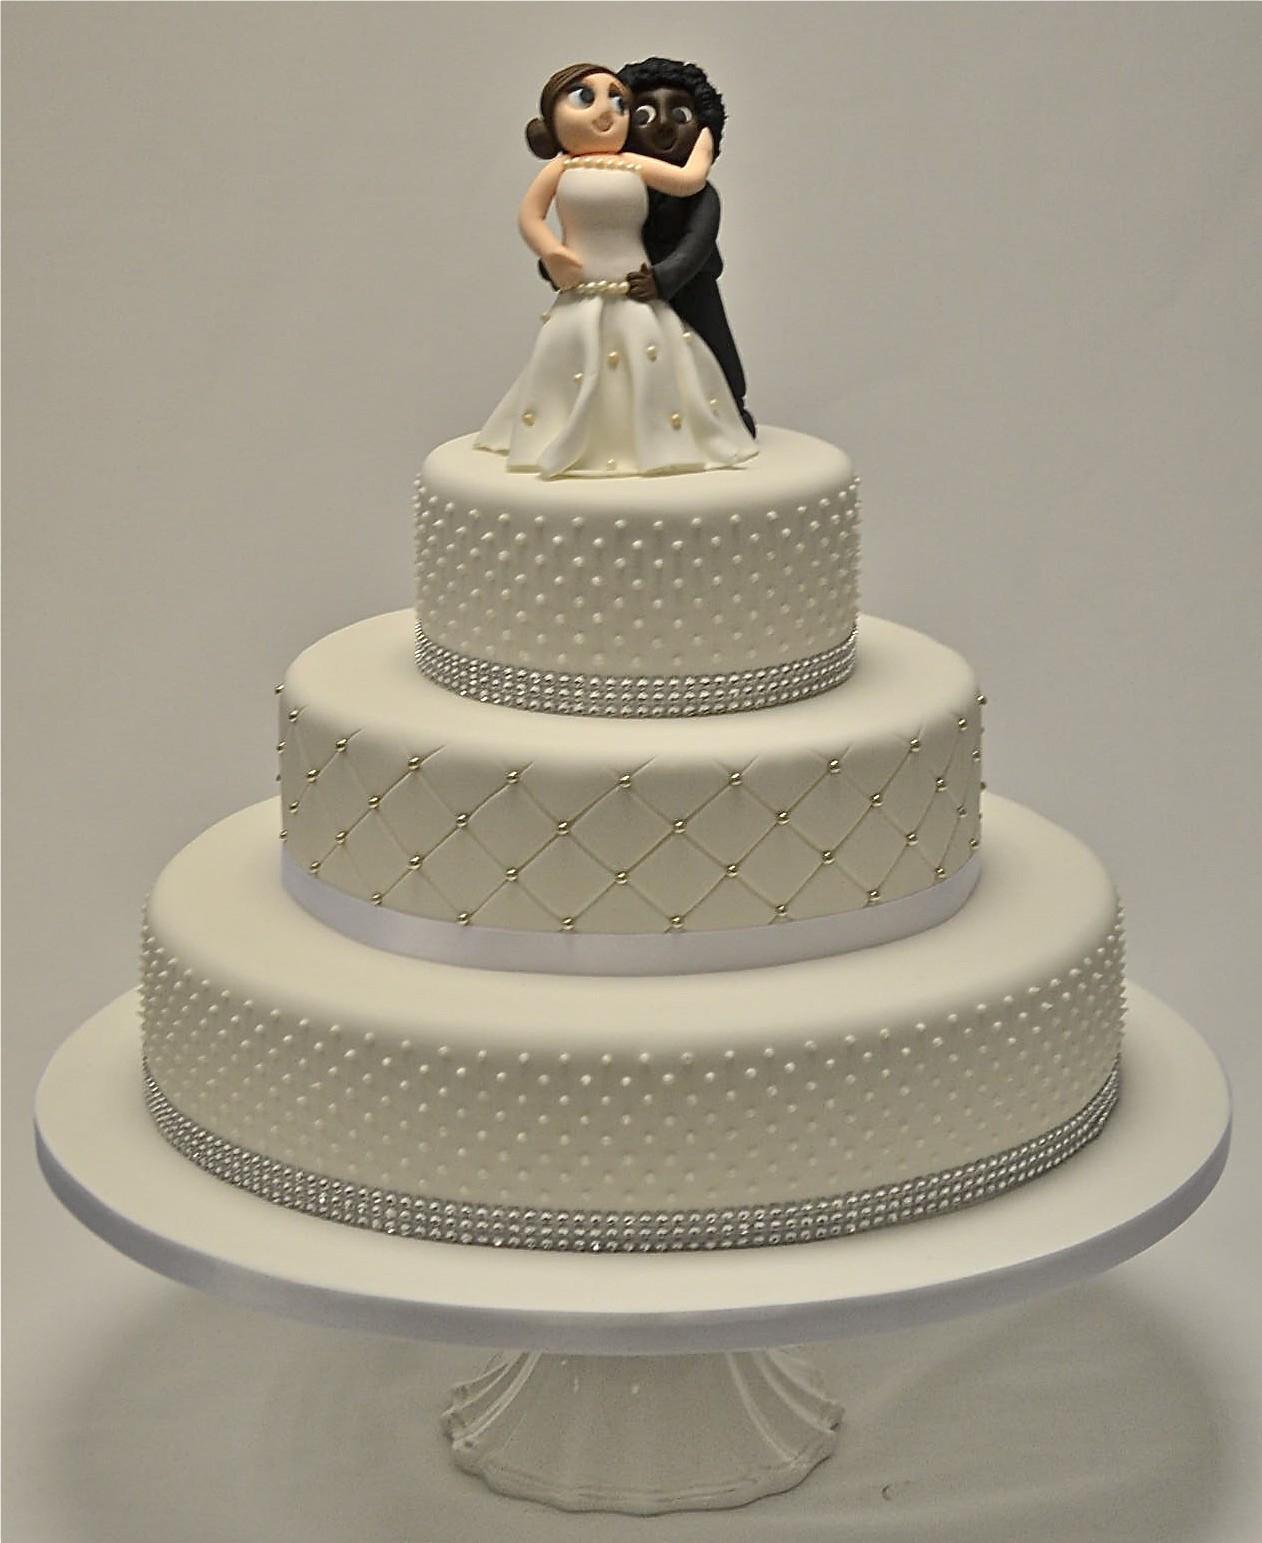 Wedding Cakes 3 Tier  3 Tier Piped Dots and Diamante Wedding Cake Wedding